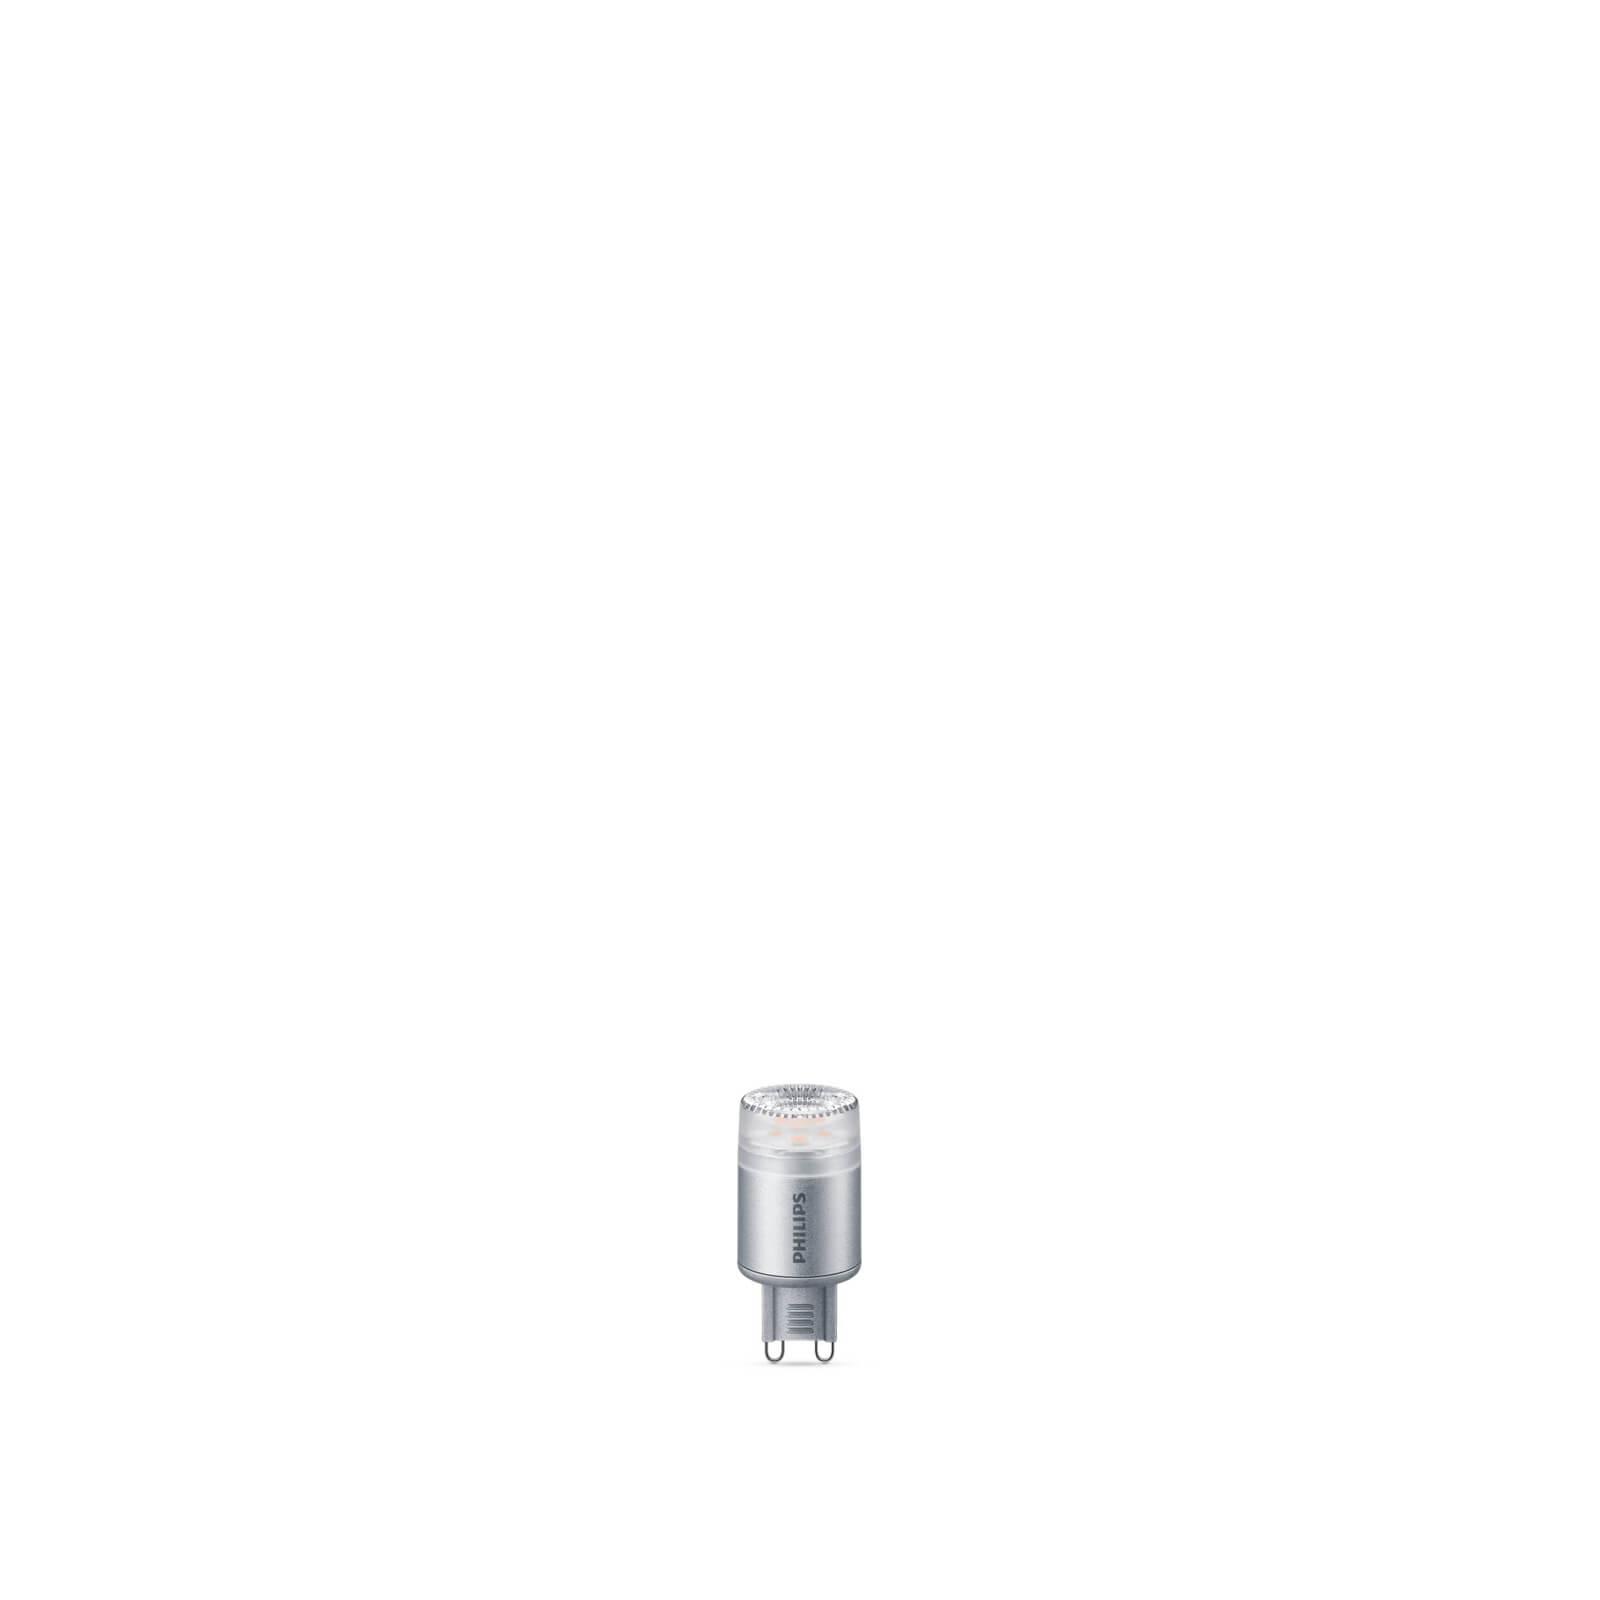 philips led capsule 2 5w 25w g9 dimbaar. Black Bedroom Furniture Sets. Home Design Ideas